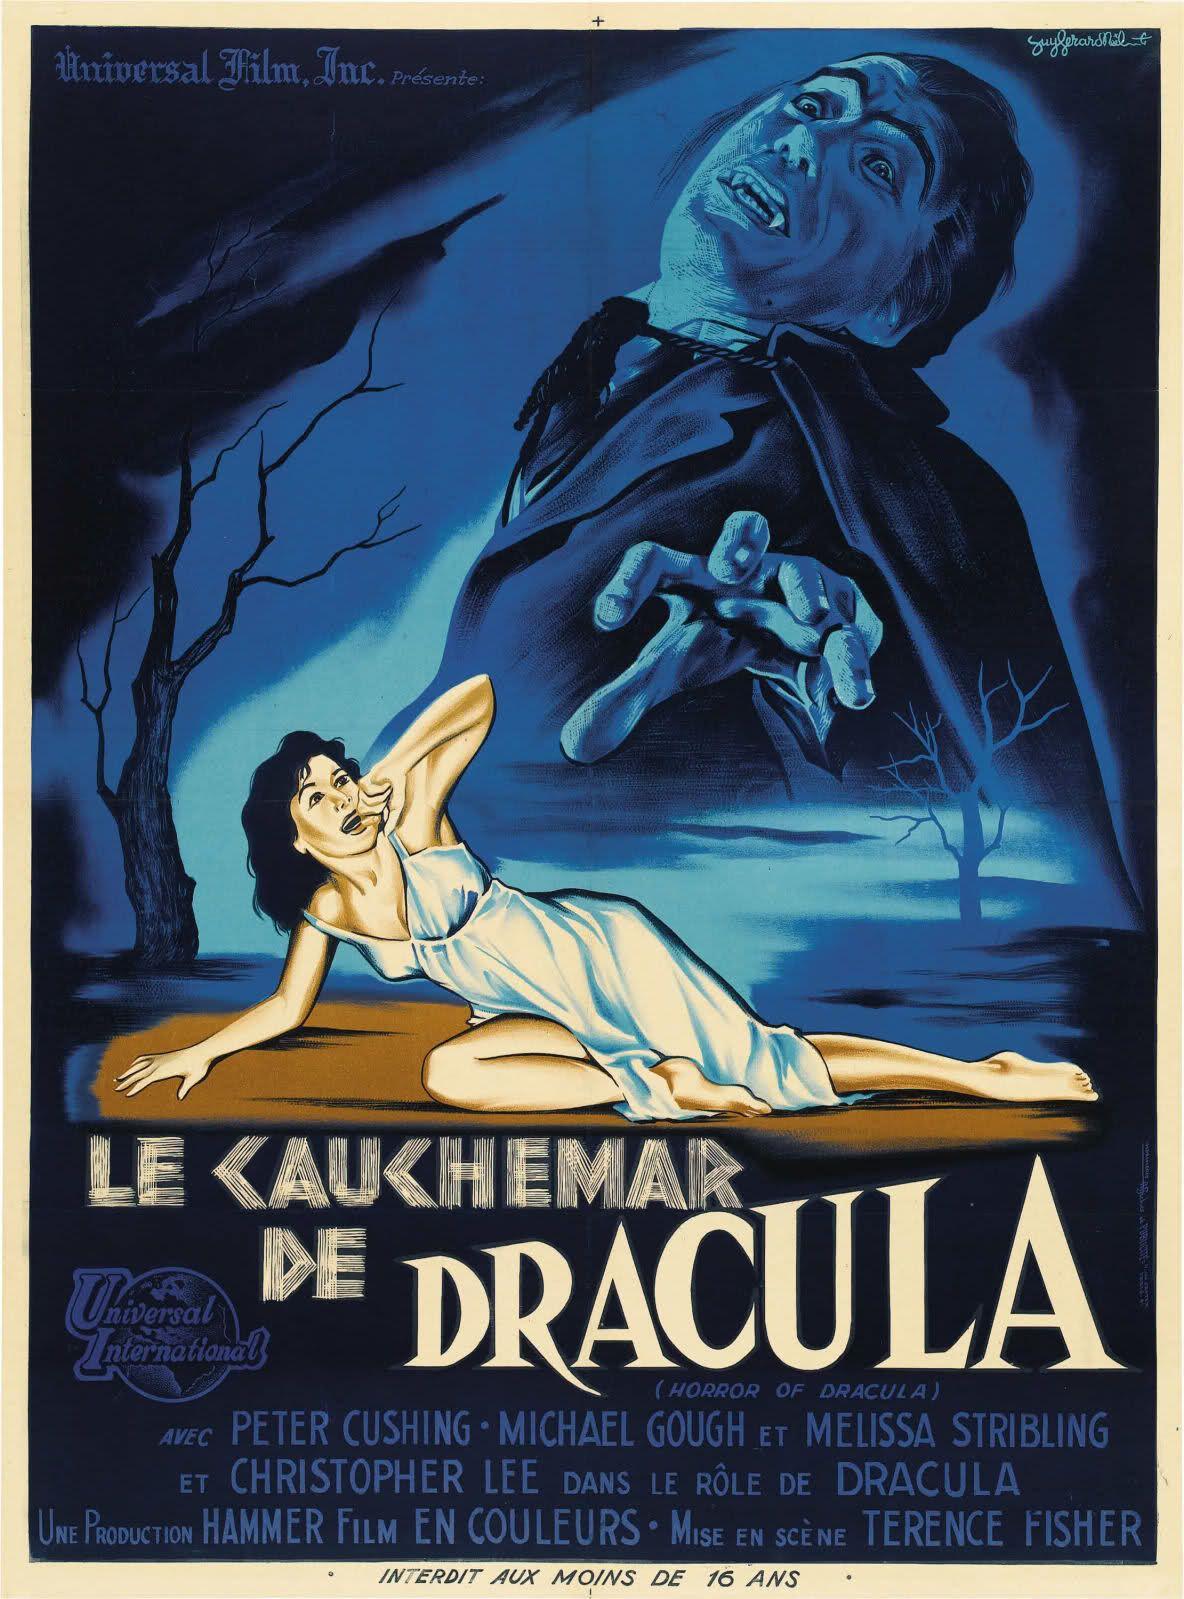 Horror of Dracula (Le cauchemar de Dracula) French Poster